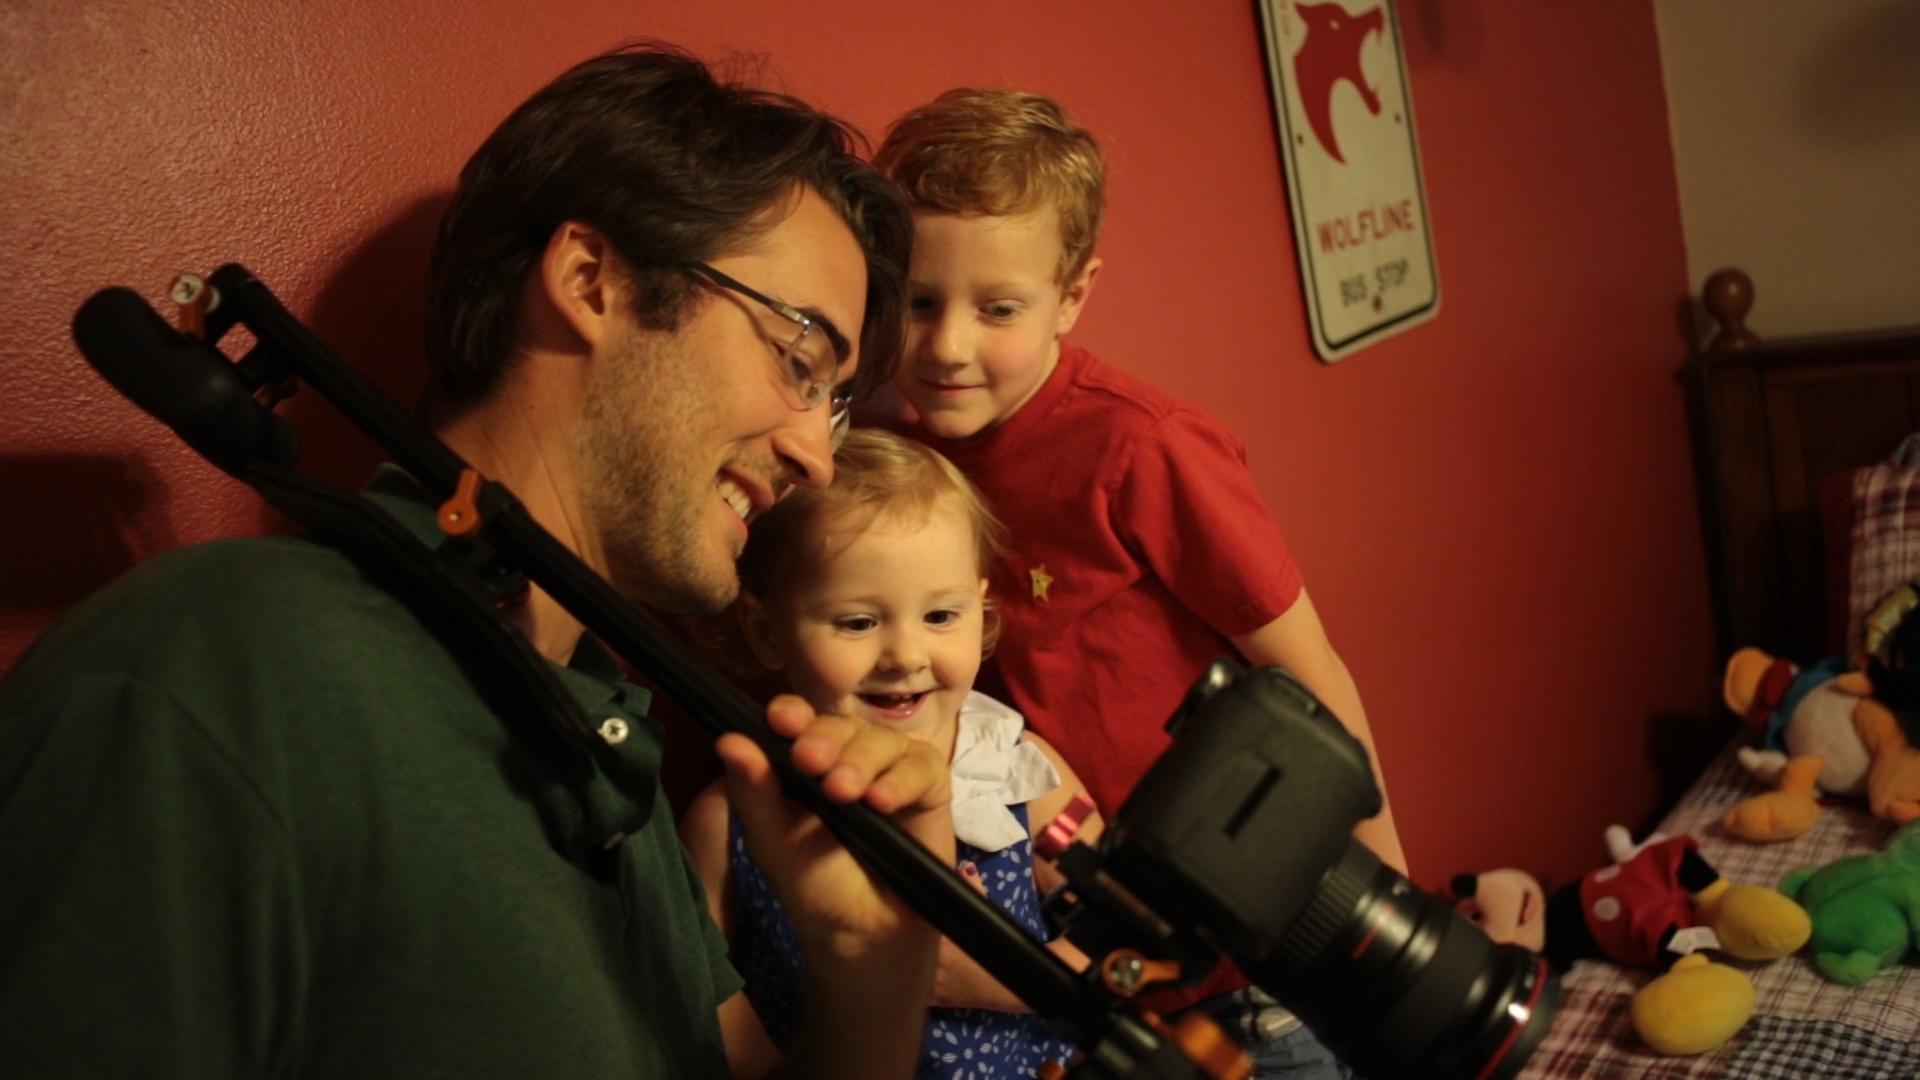 Woodwalk David Gwynn shares video with kids